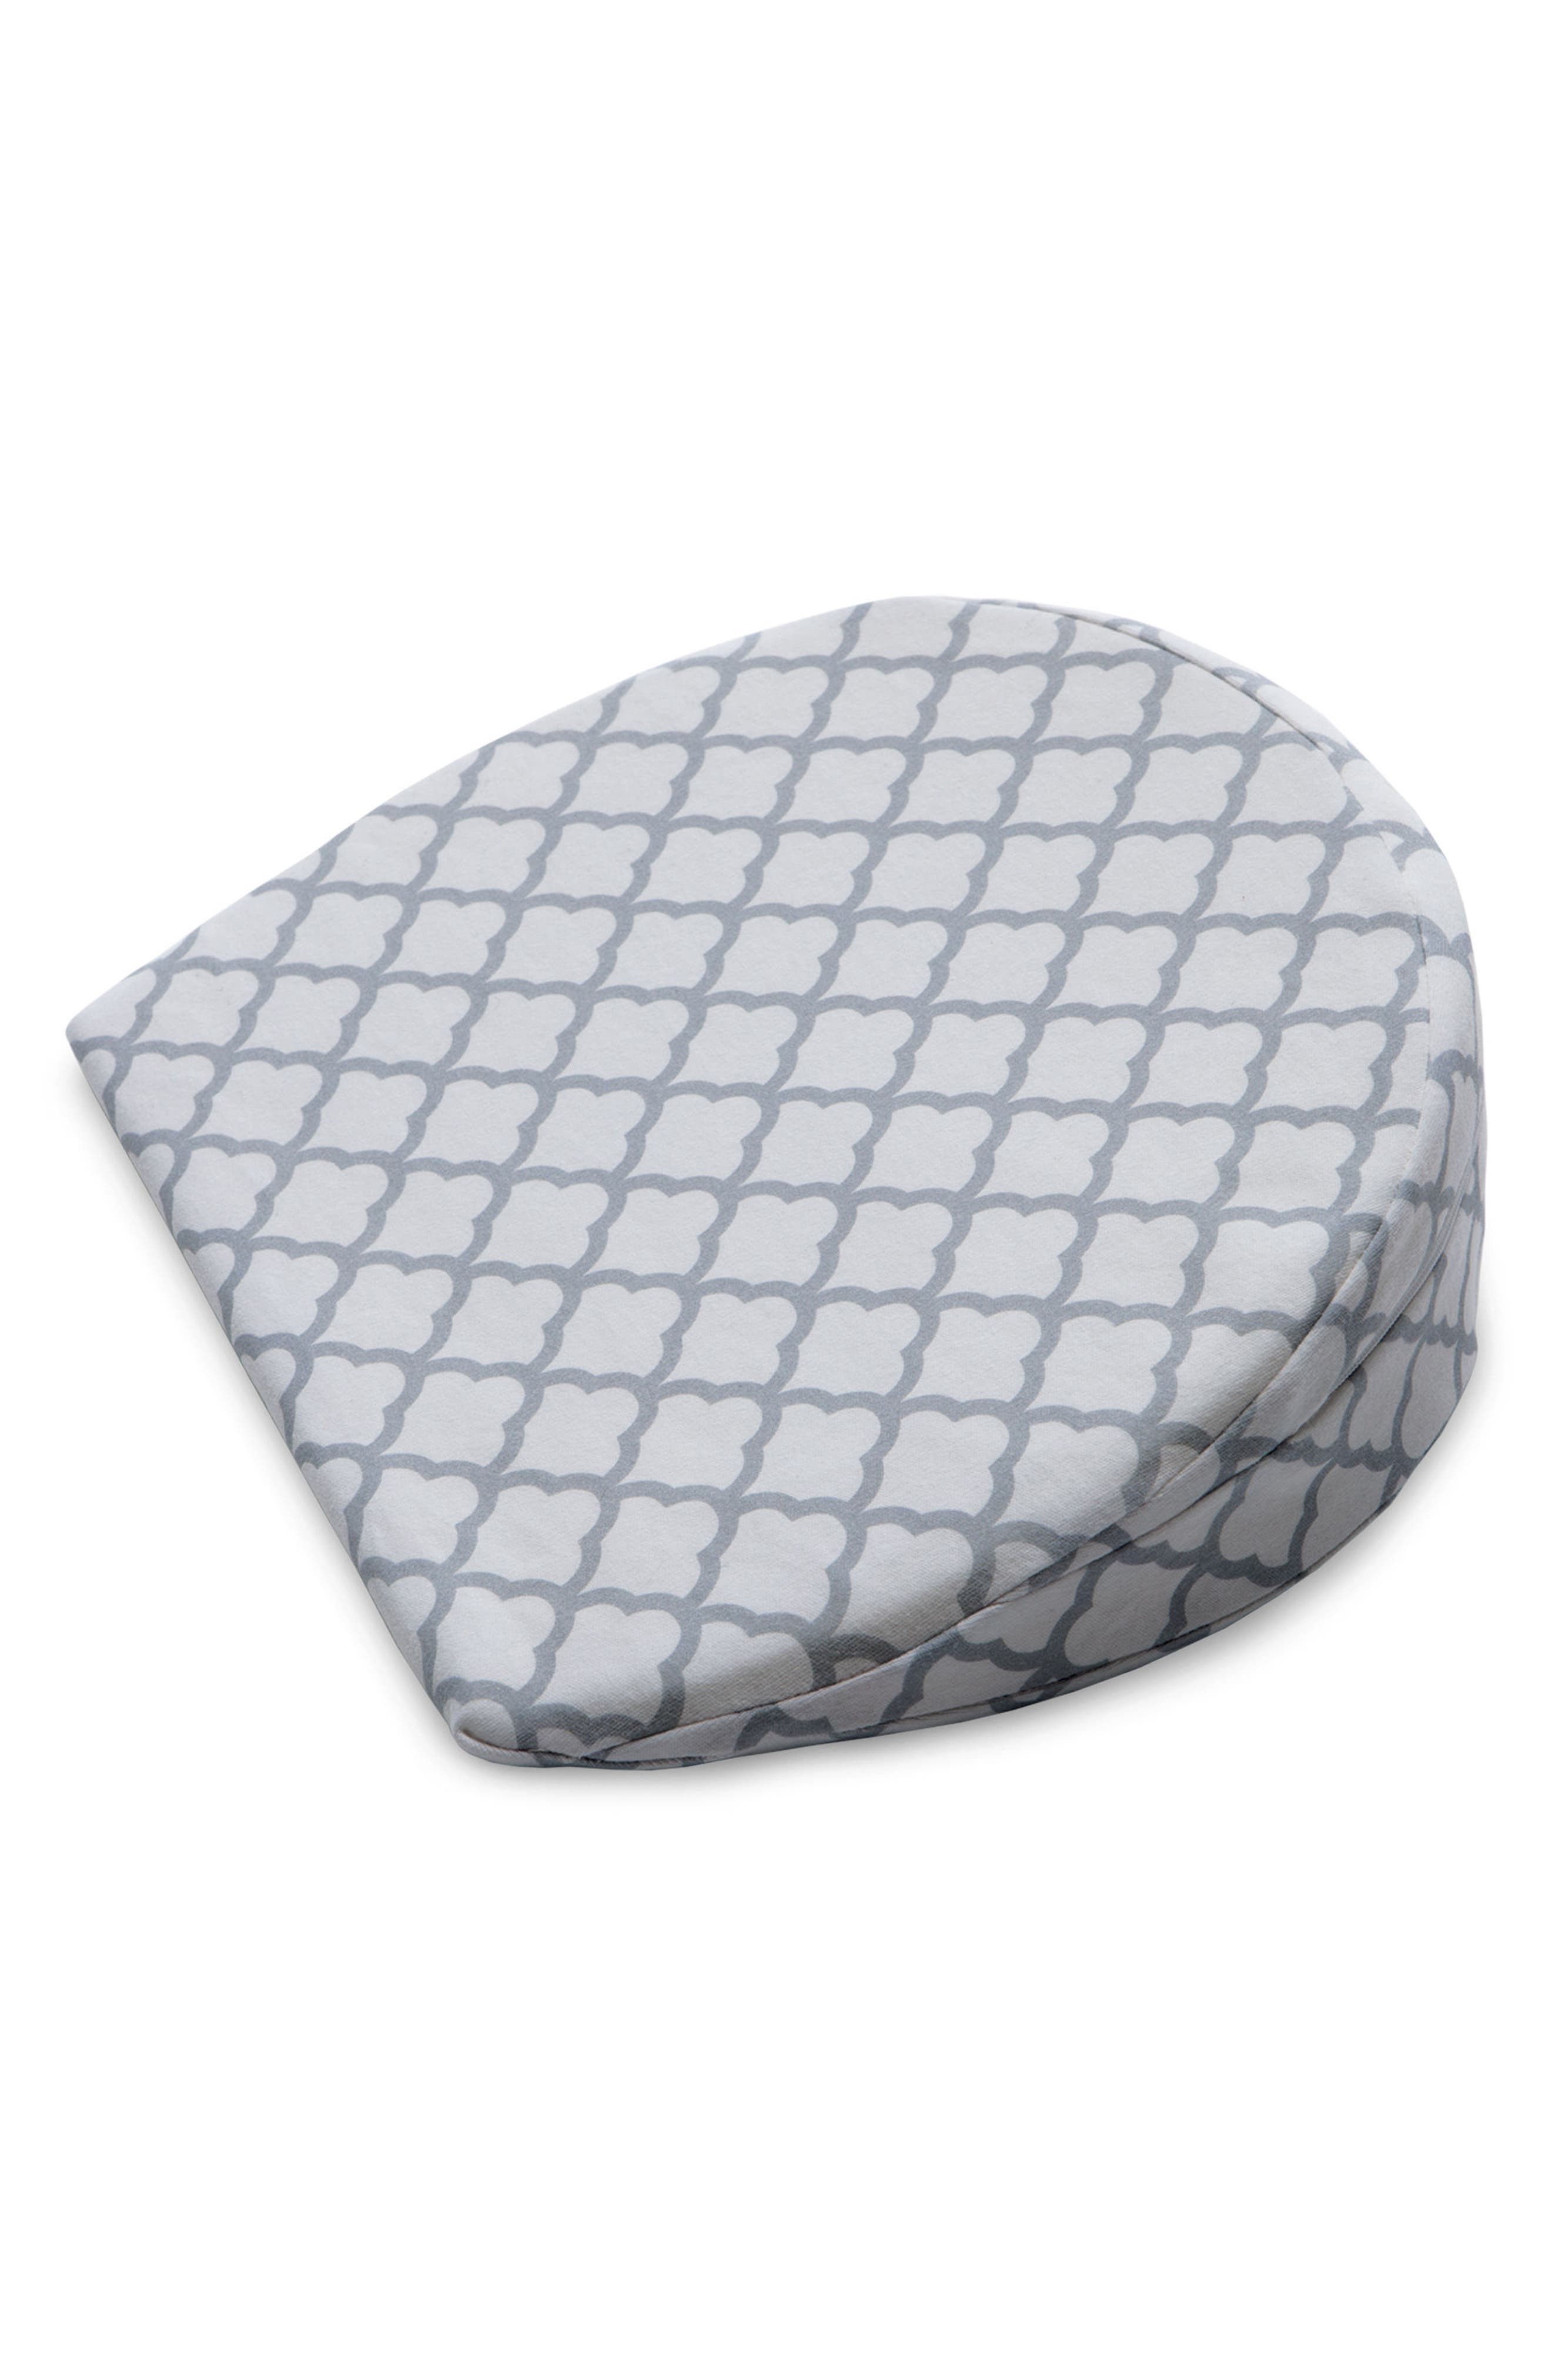 Pregnancy Wedge Cushion & Slipcover,                             Main thumbnail 1, color,                             WHITE TRELLIS